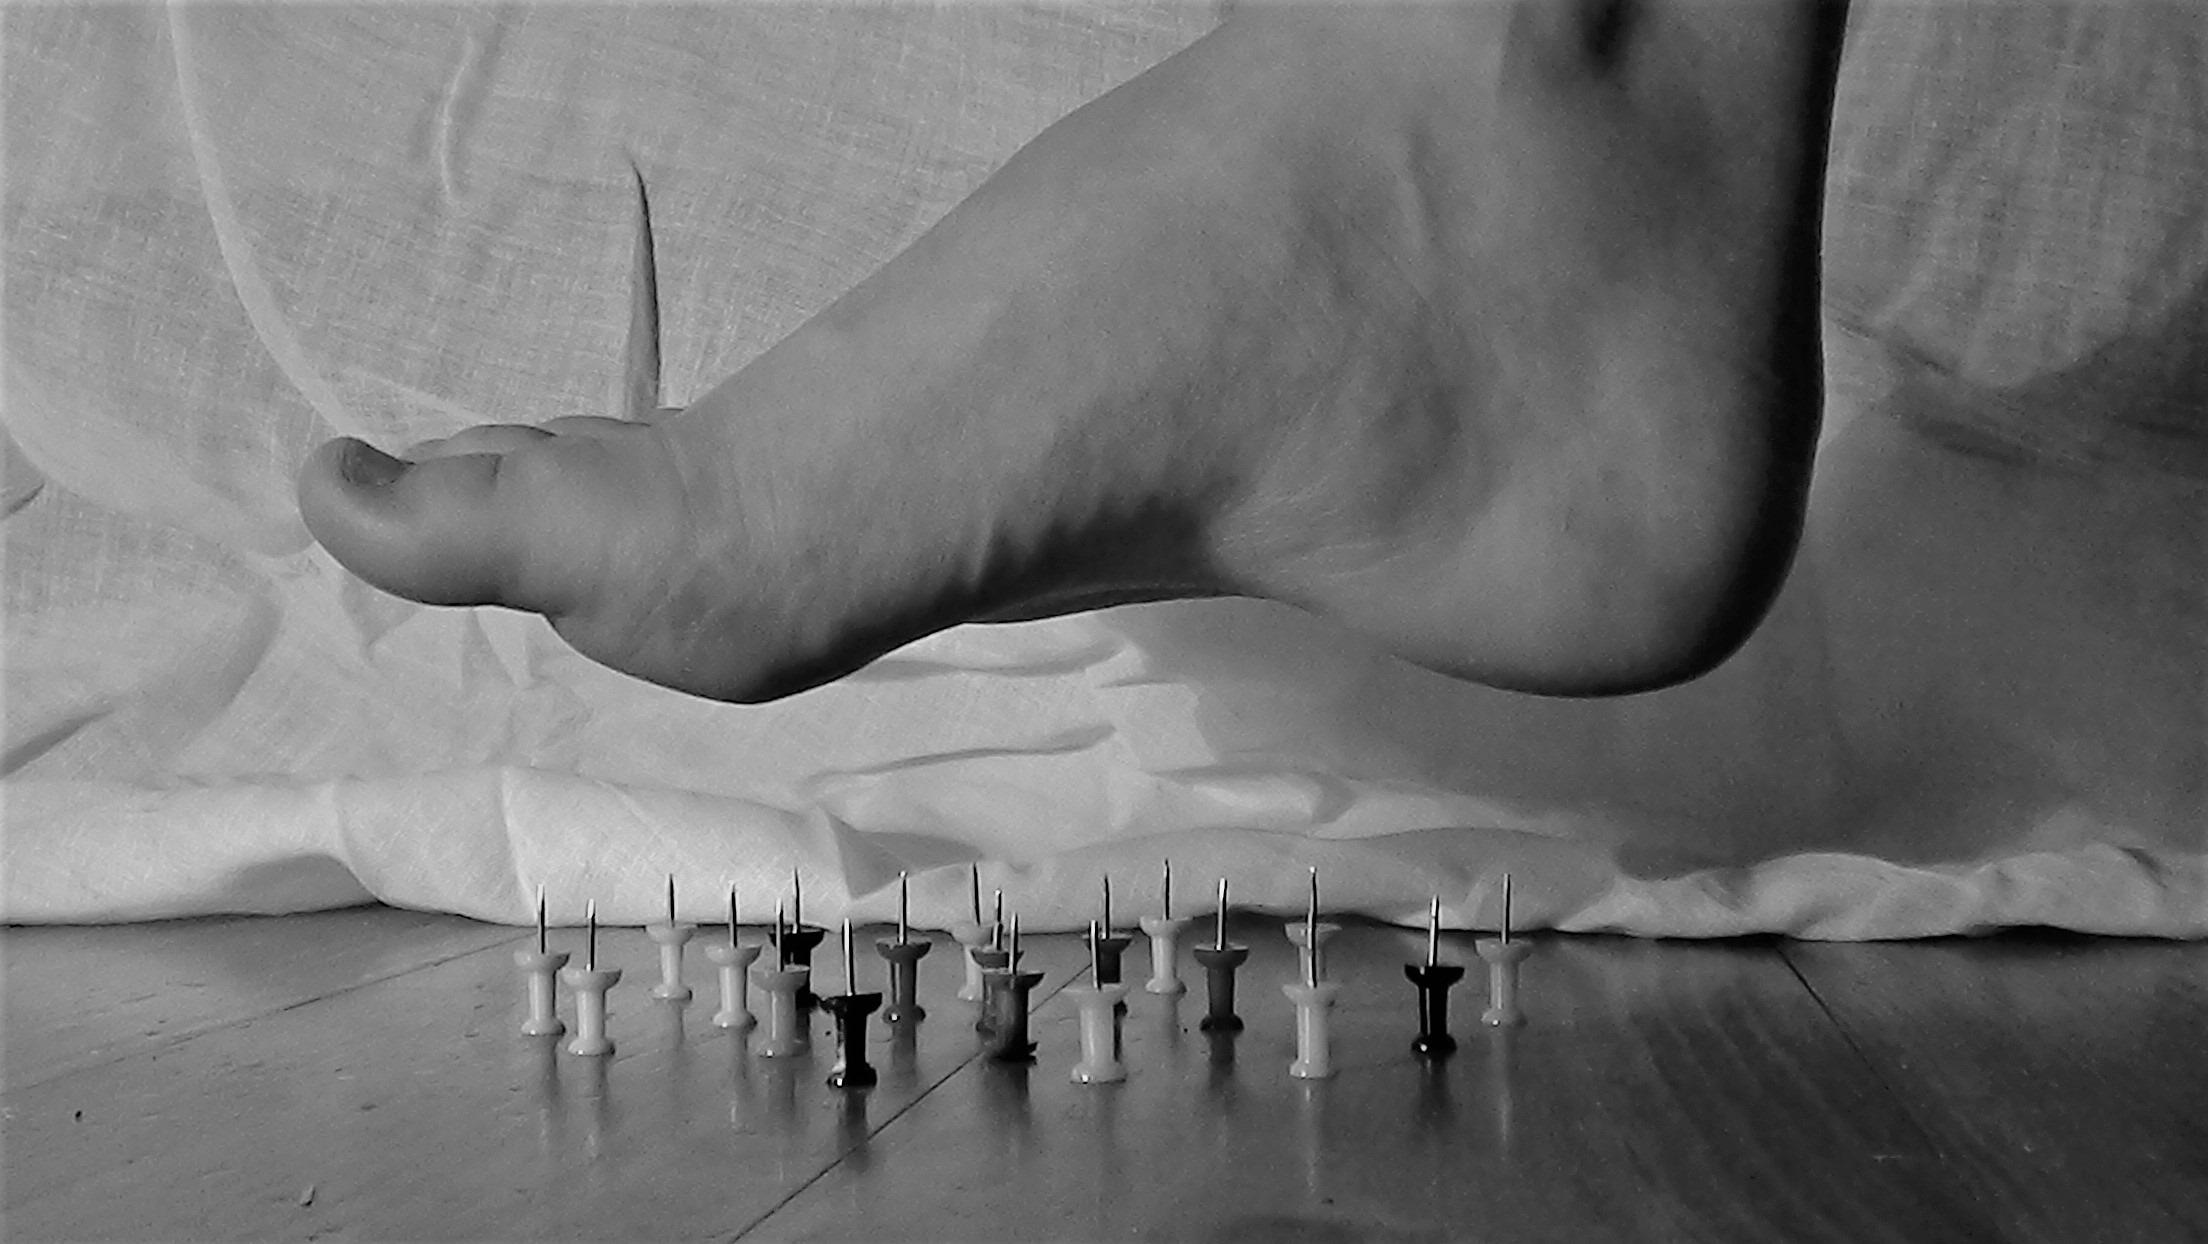 diabetic peripheral neuropathy feels like stepping on pins